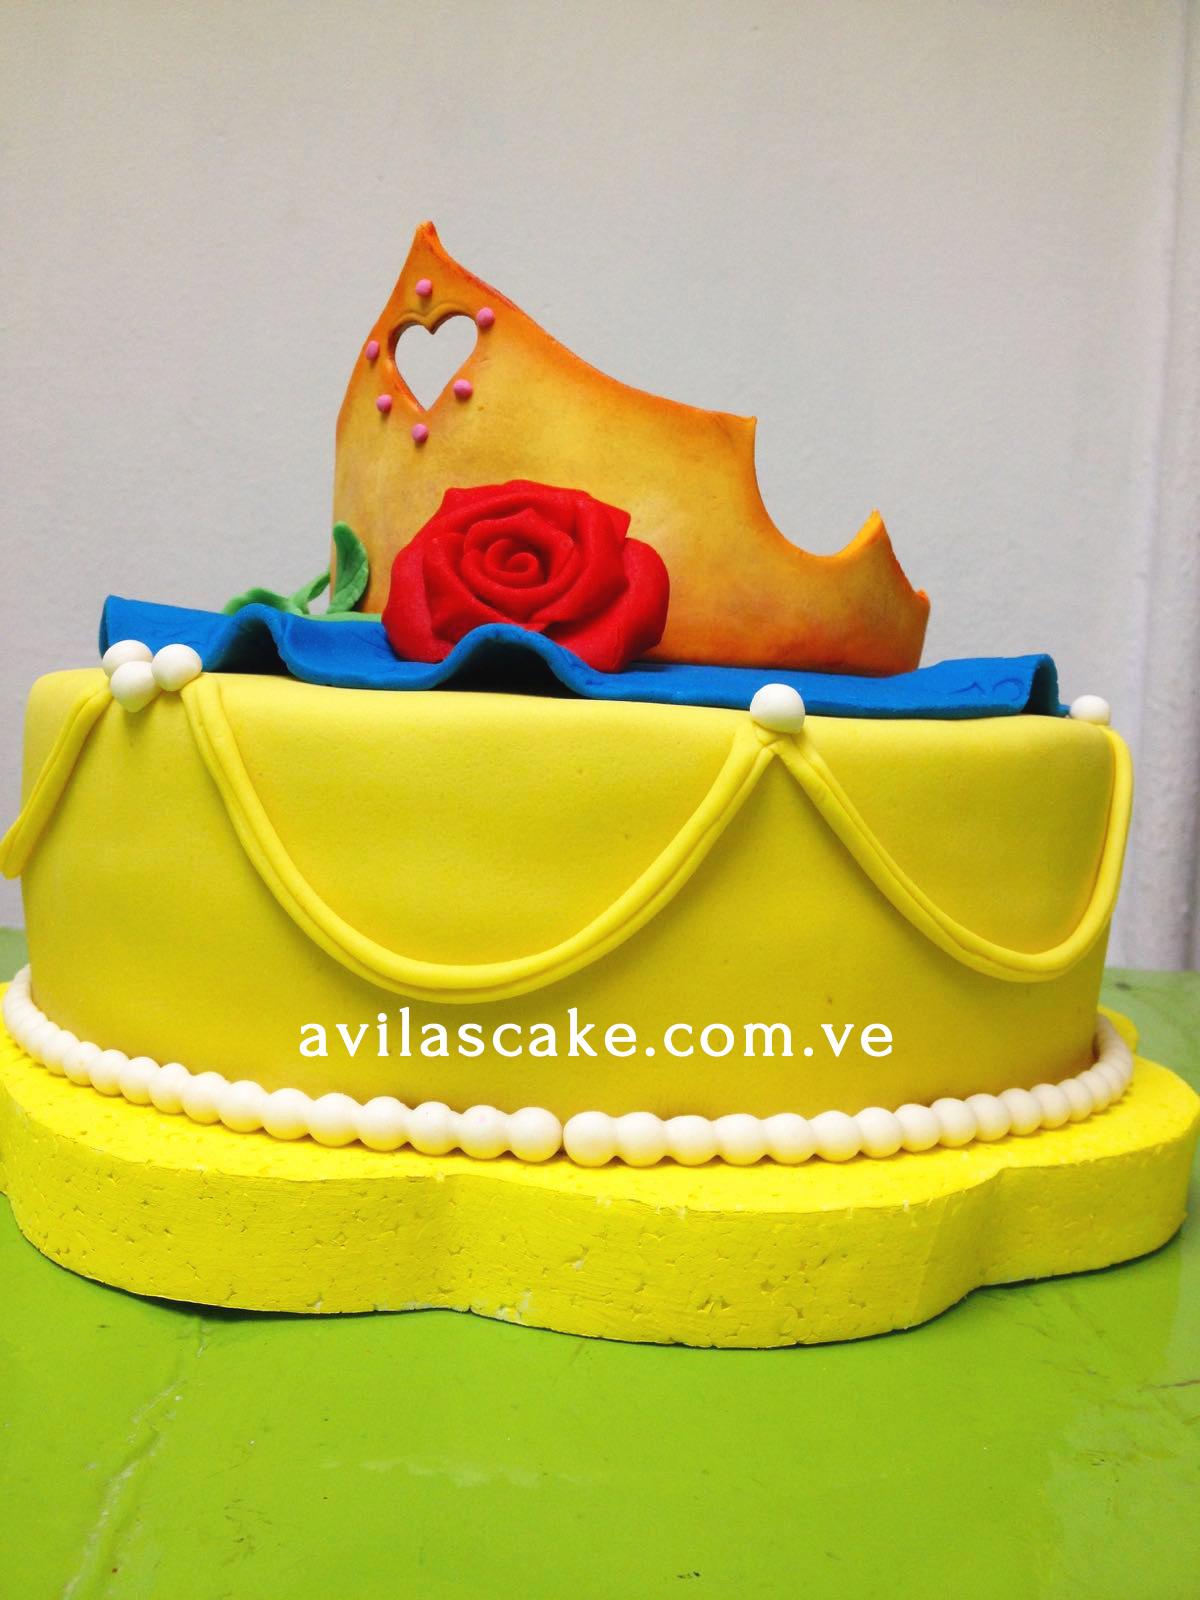 Cake Pelicula